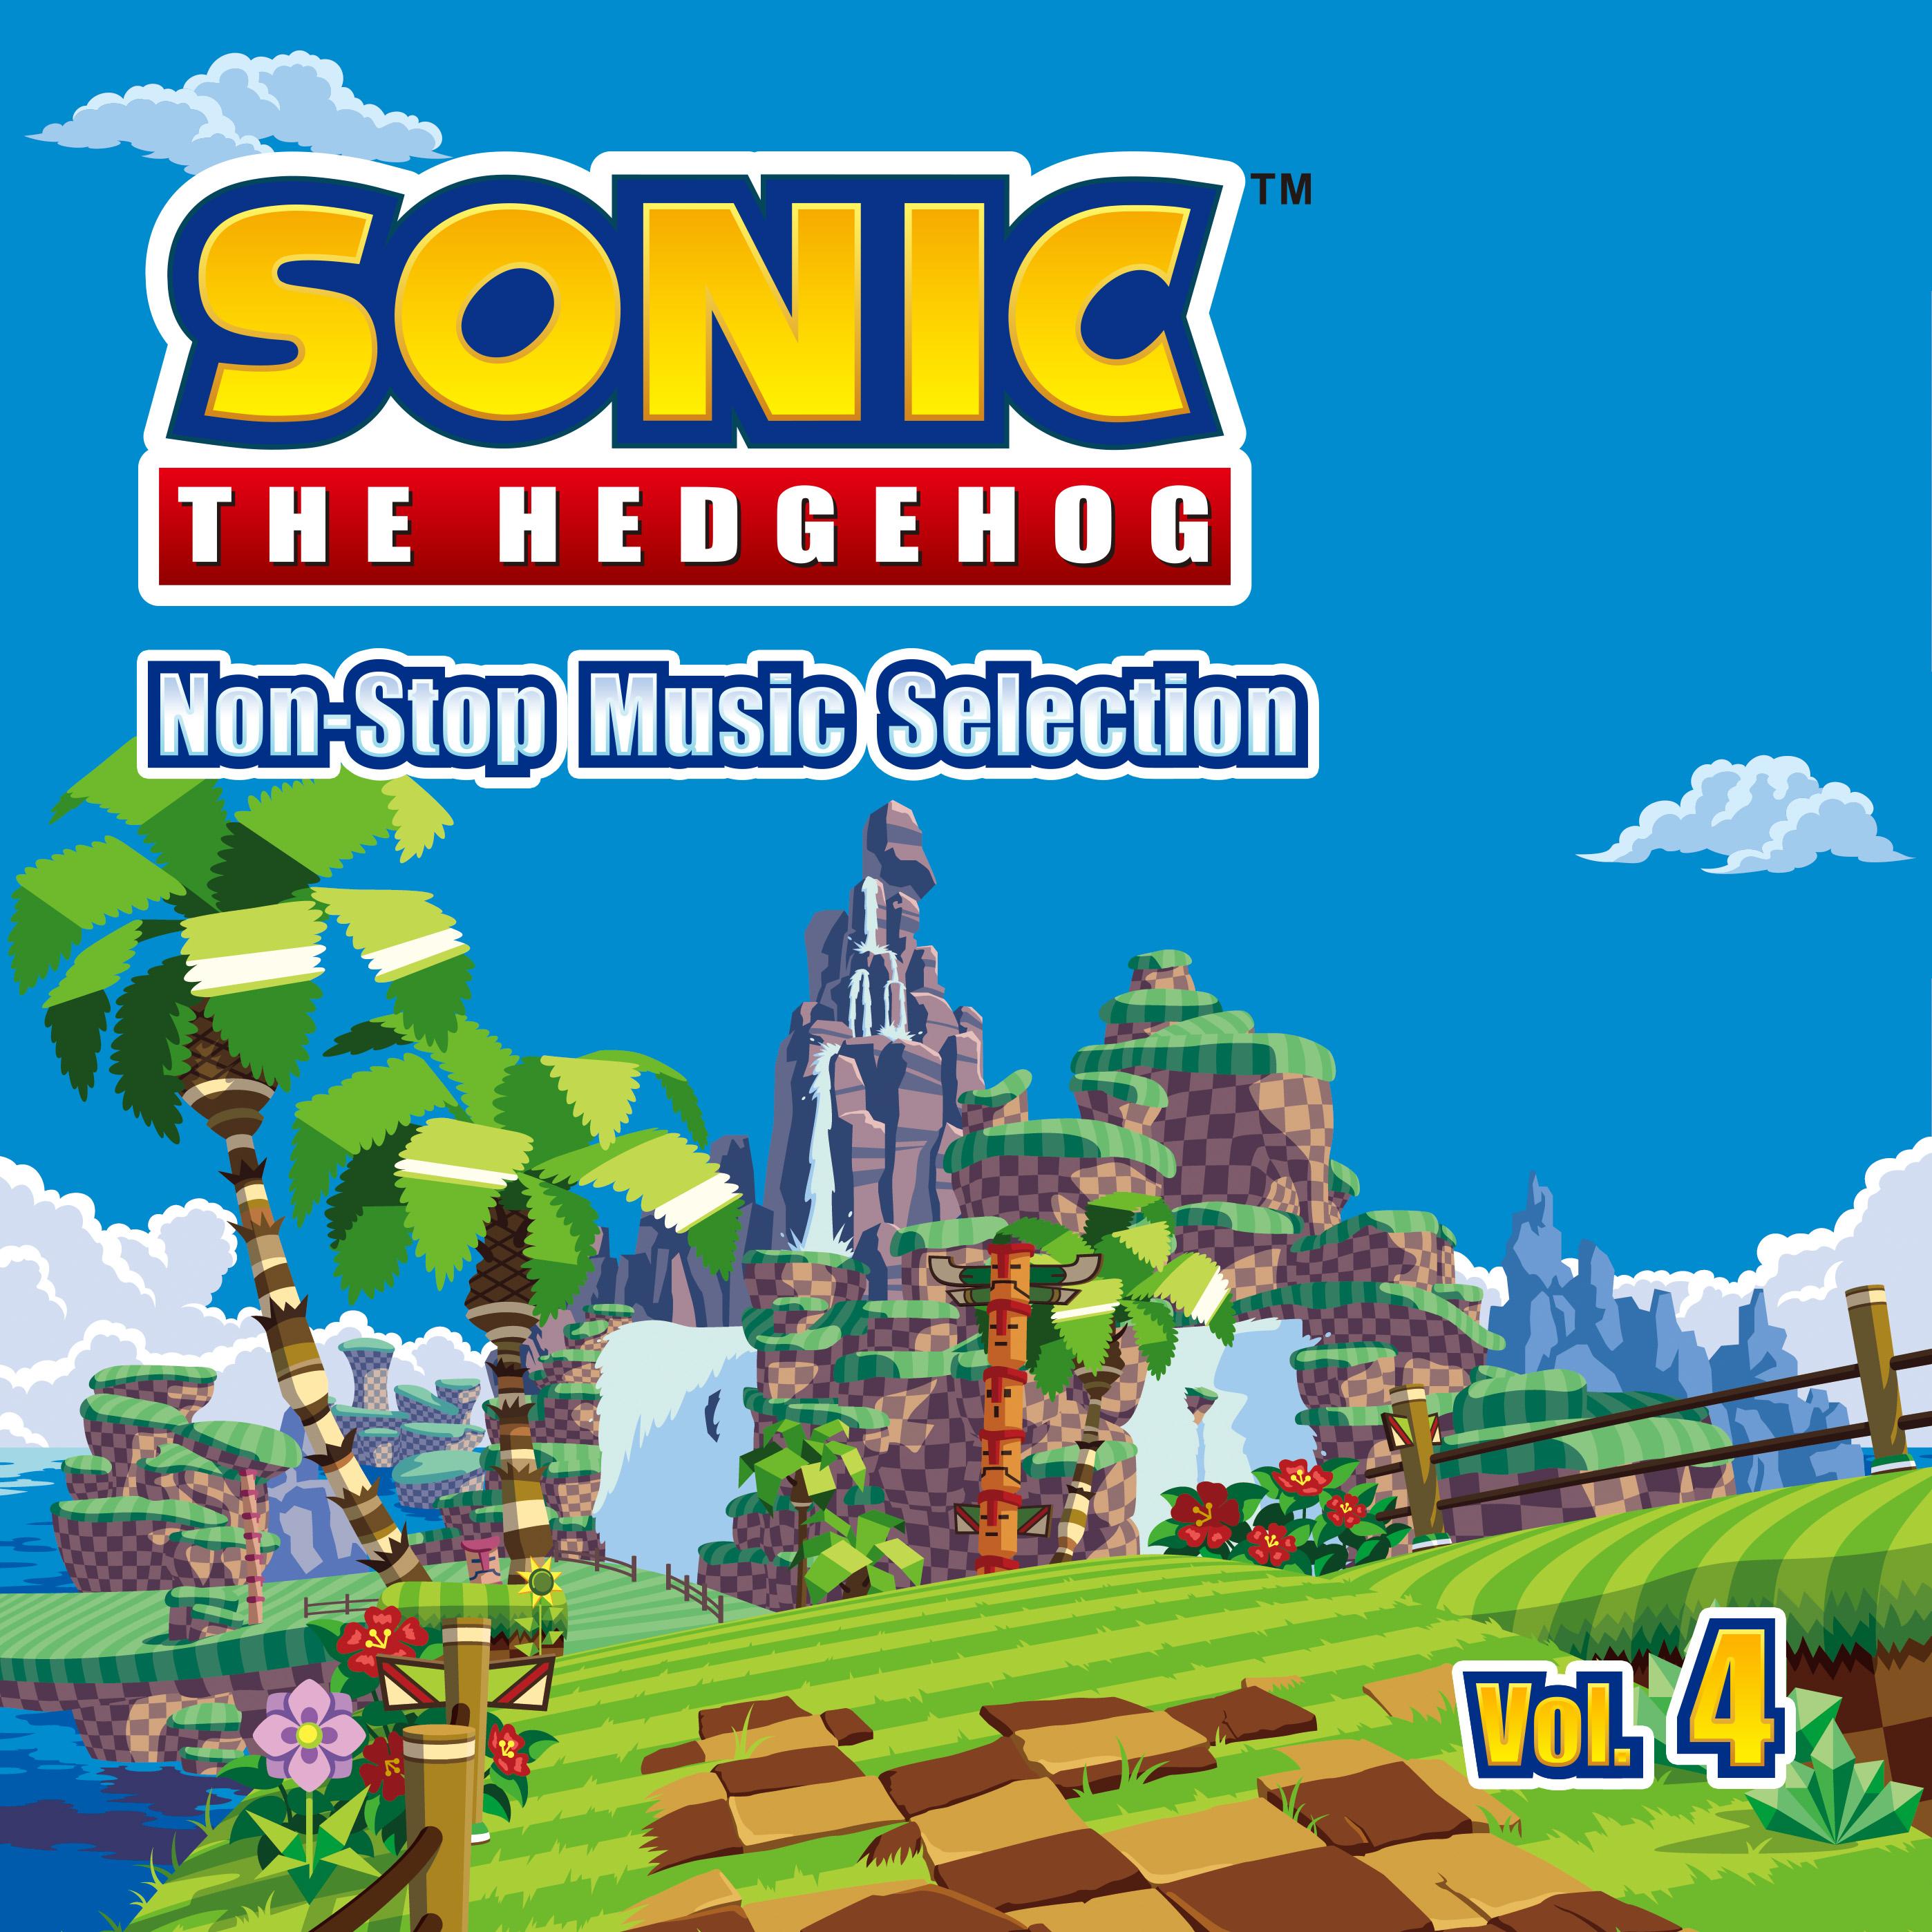 「SONIC2020」プロジェクト「ソニック」シリーズのコンピレーションアルバム『Sonic The Hedgehog Non-Stop Music Selection Vol.4』配信開始!